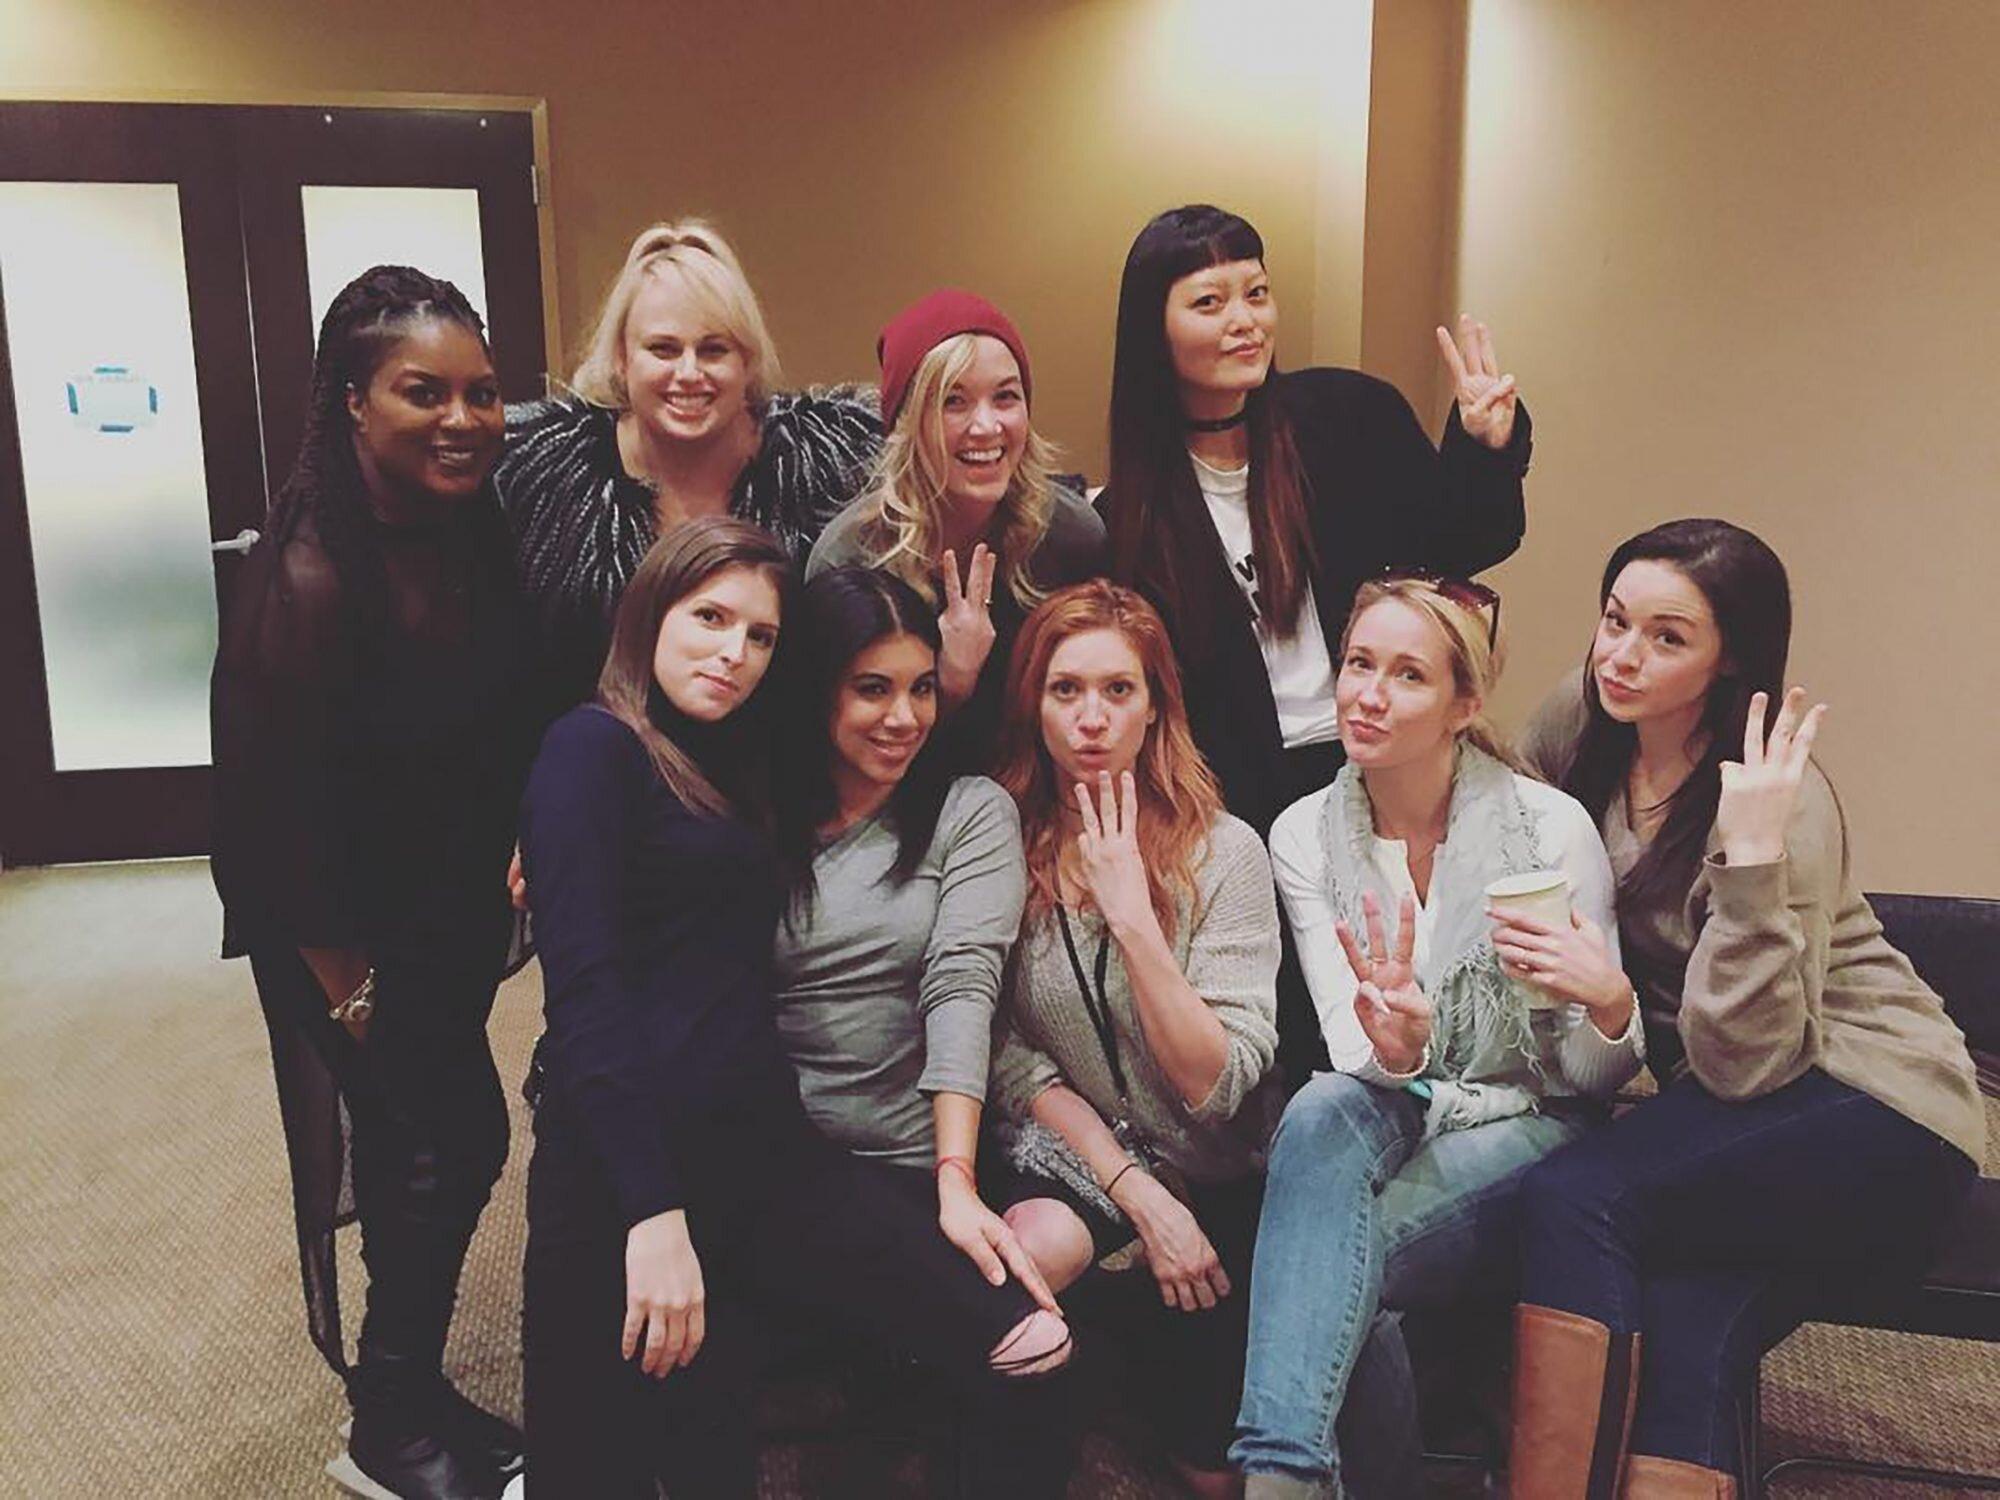 Pitch Perfect 3 Anna Kendrick Rebel Wilson Reunite With Bellas Ew Com